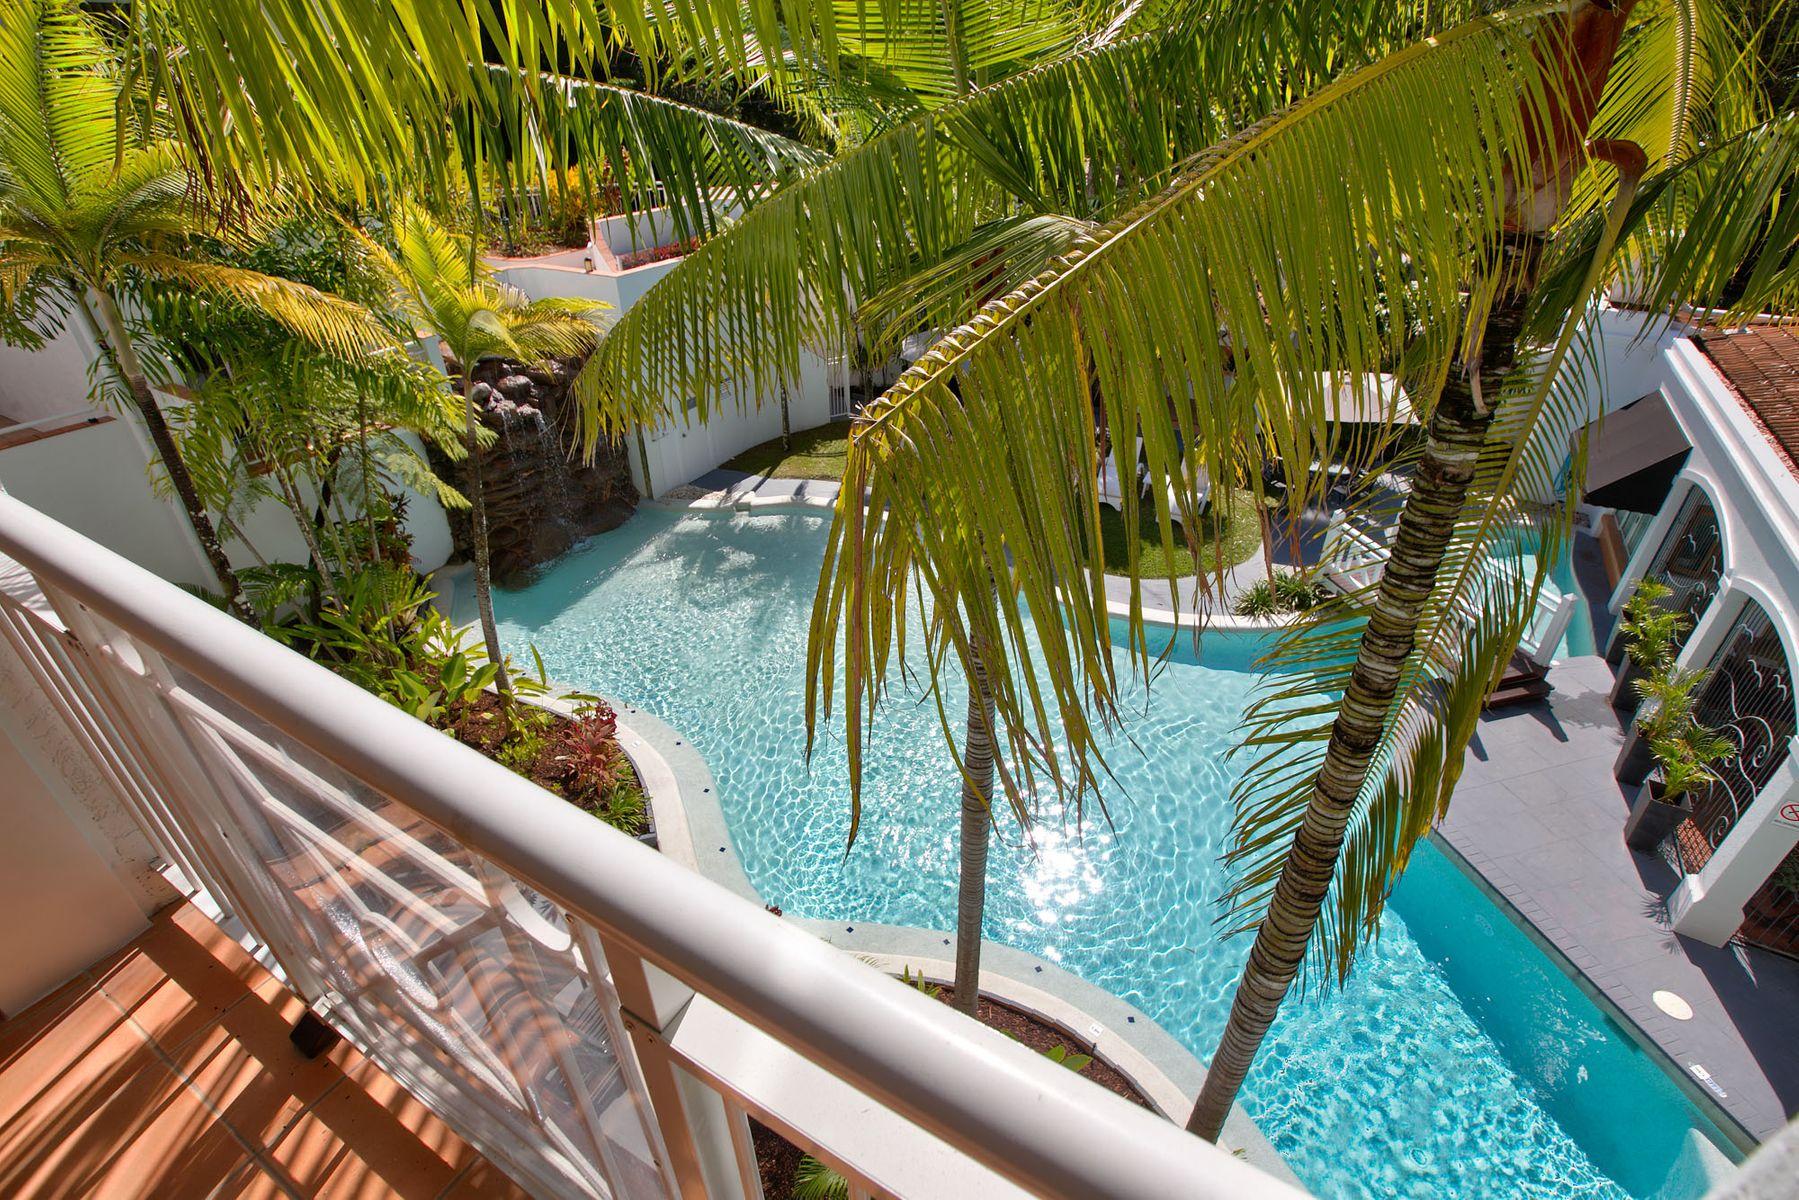 305/139-143 Williams Esplanade, Palm Cove, QLD 4879